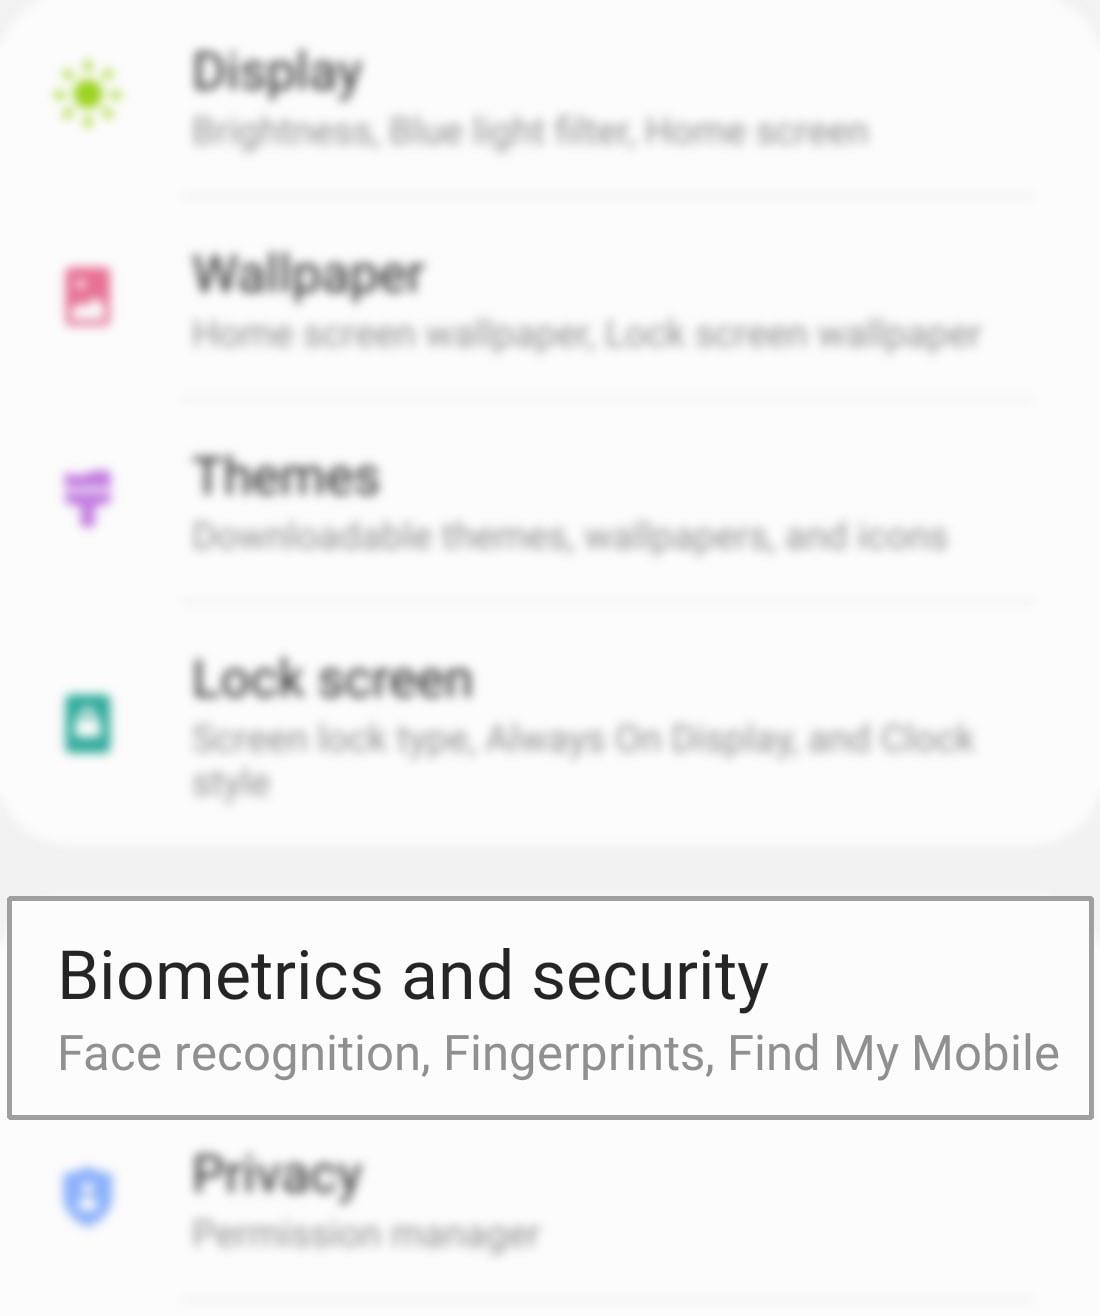 encrypt-decrypt sd card on galaxy s20 - biometrics and security